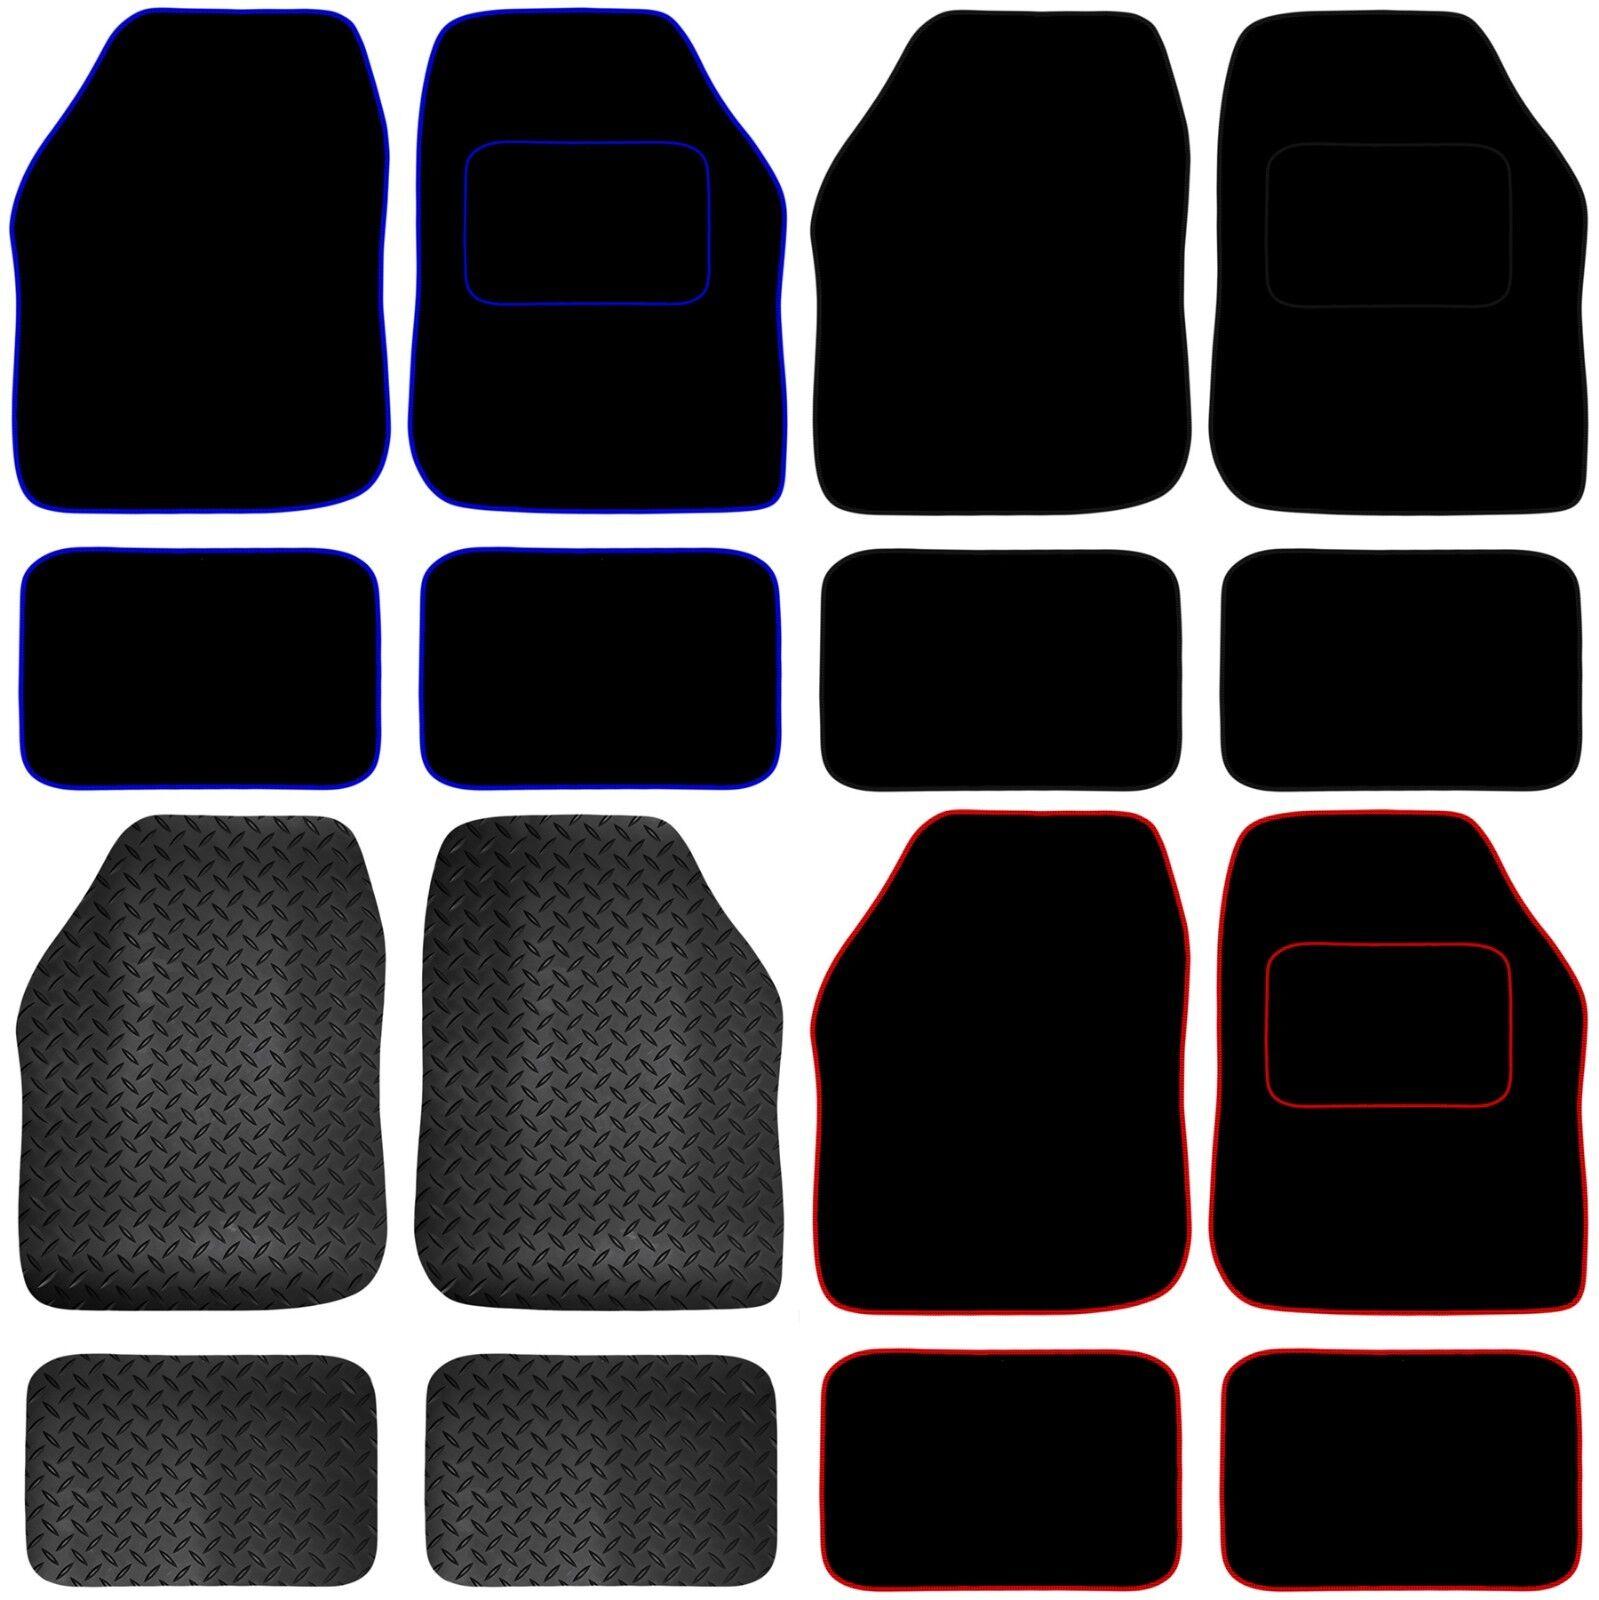 Car Parts - Universal Car or Van Floor Mats 4PC Set Non Slip Carpet or Rubber Red,Blue,Black